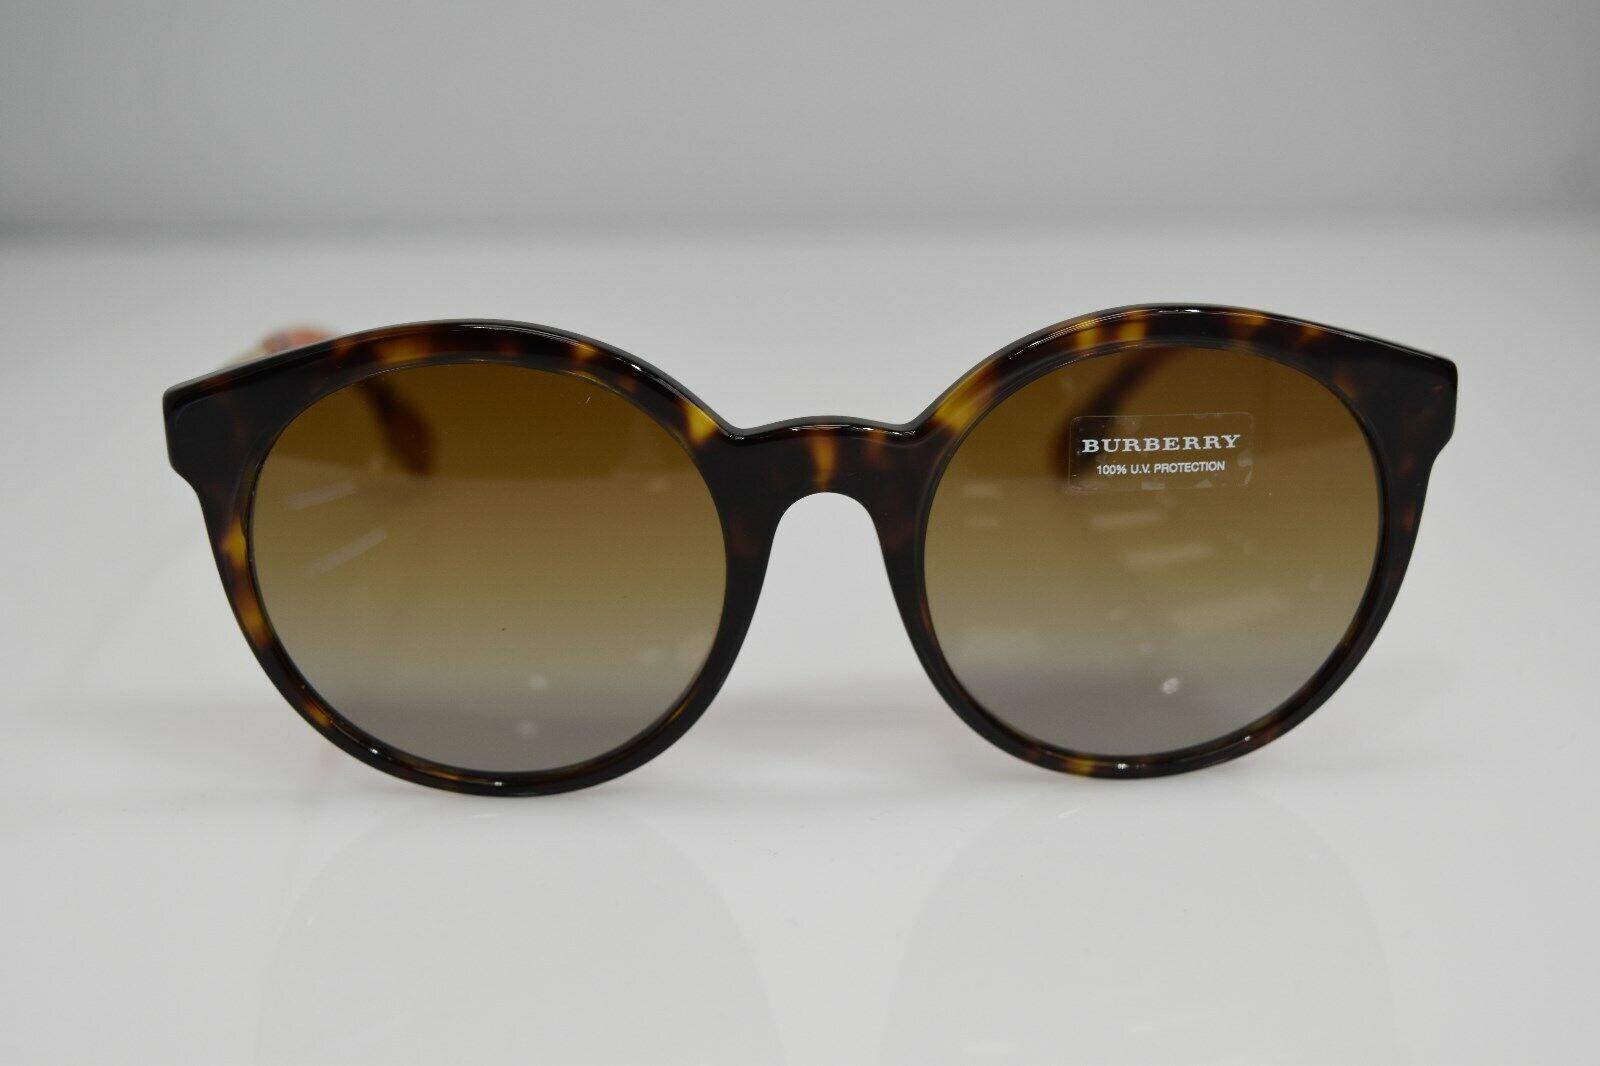 Burberry Havana Gold B4296 3816/T5 53-20-140 Sunglasses